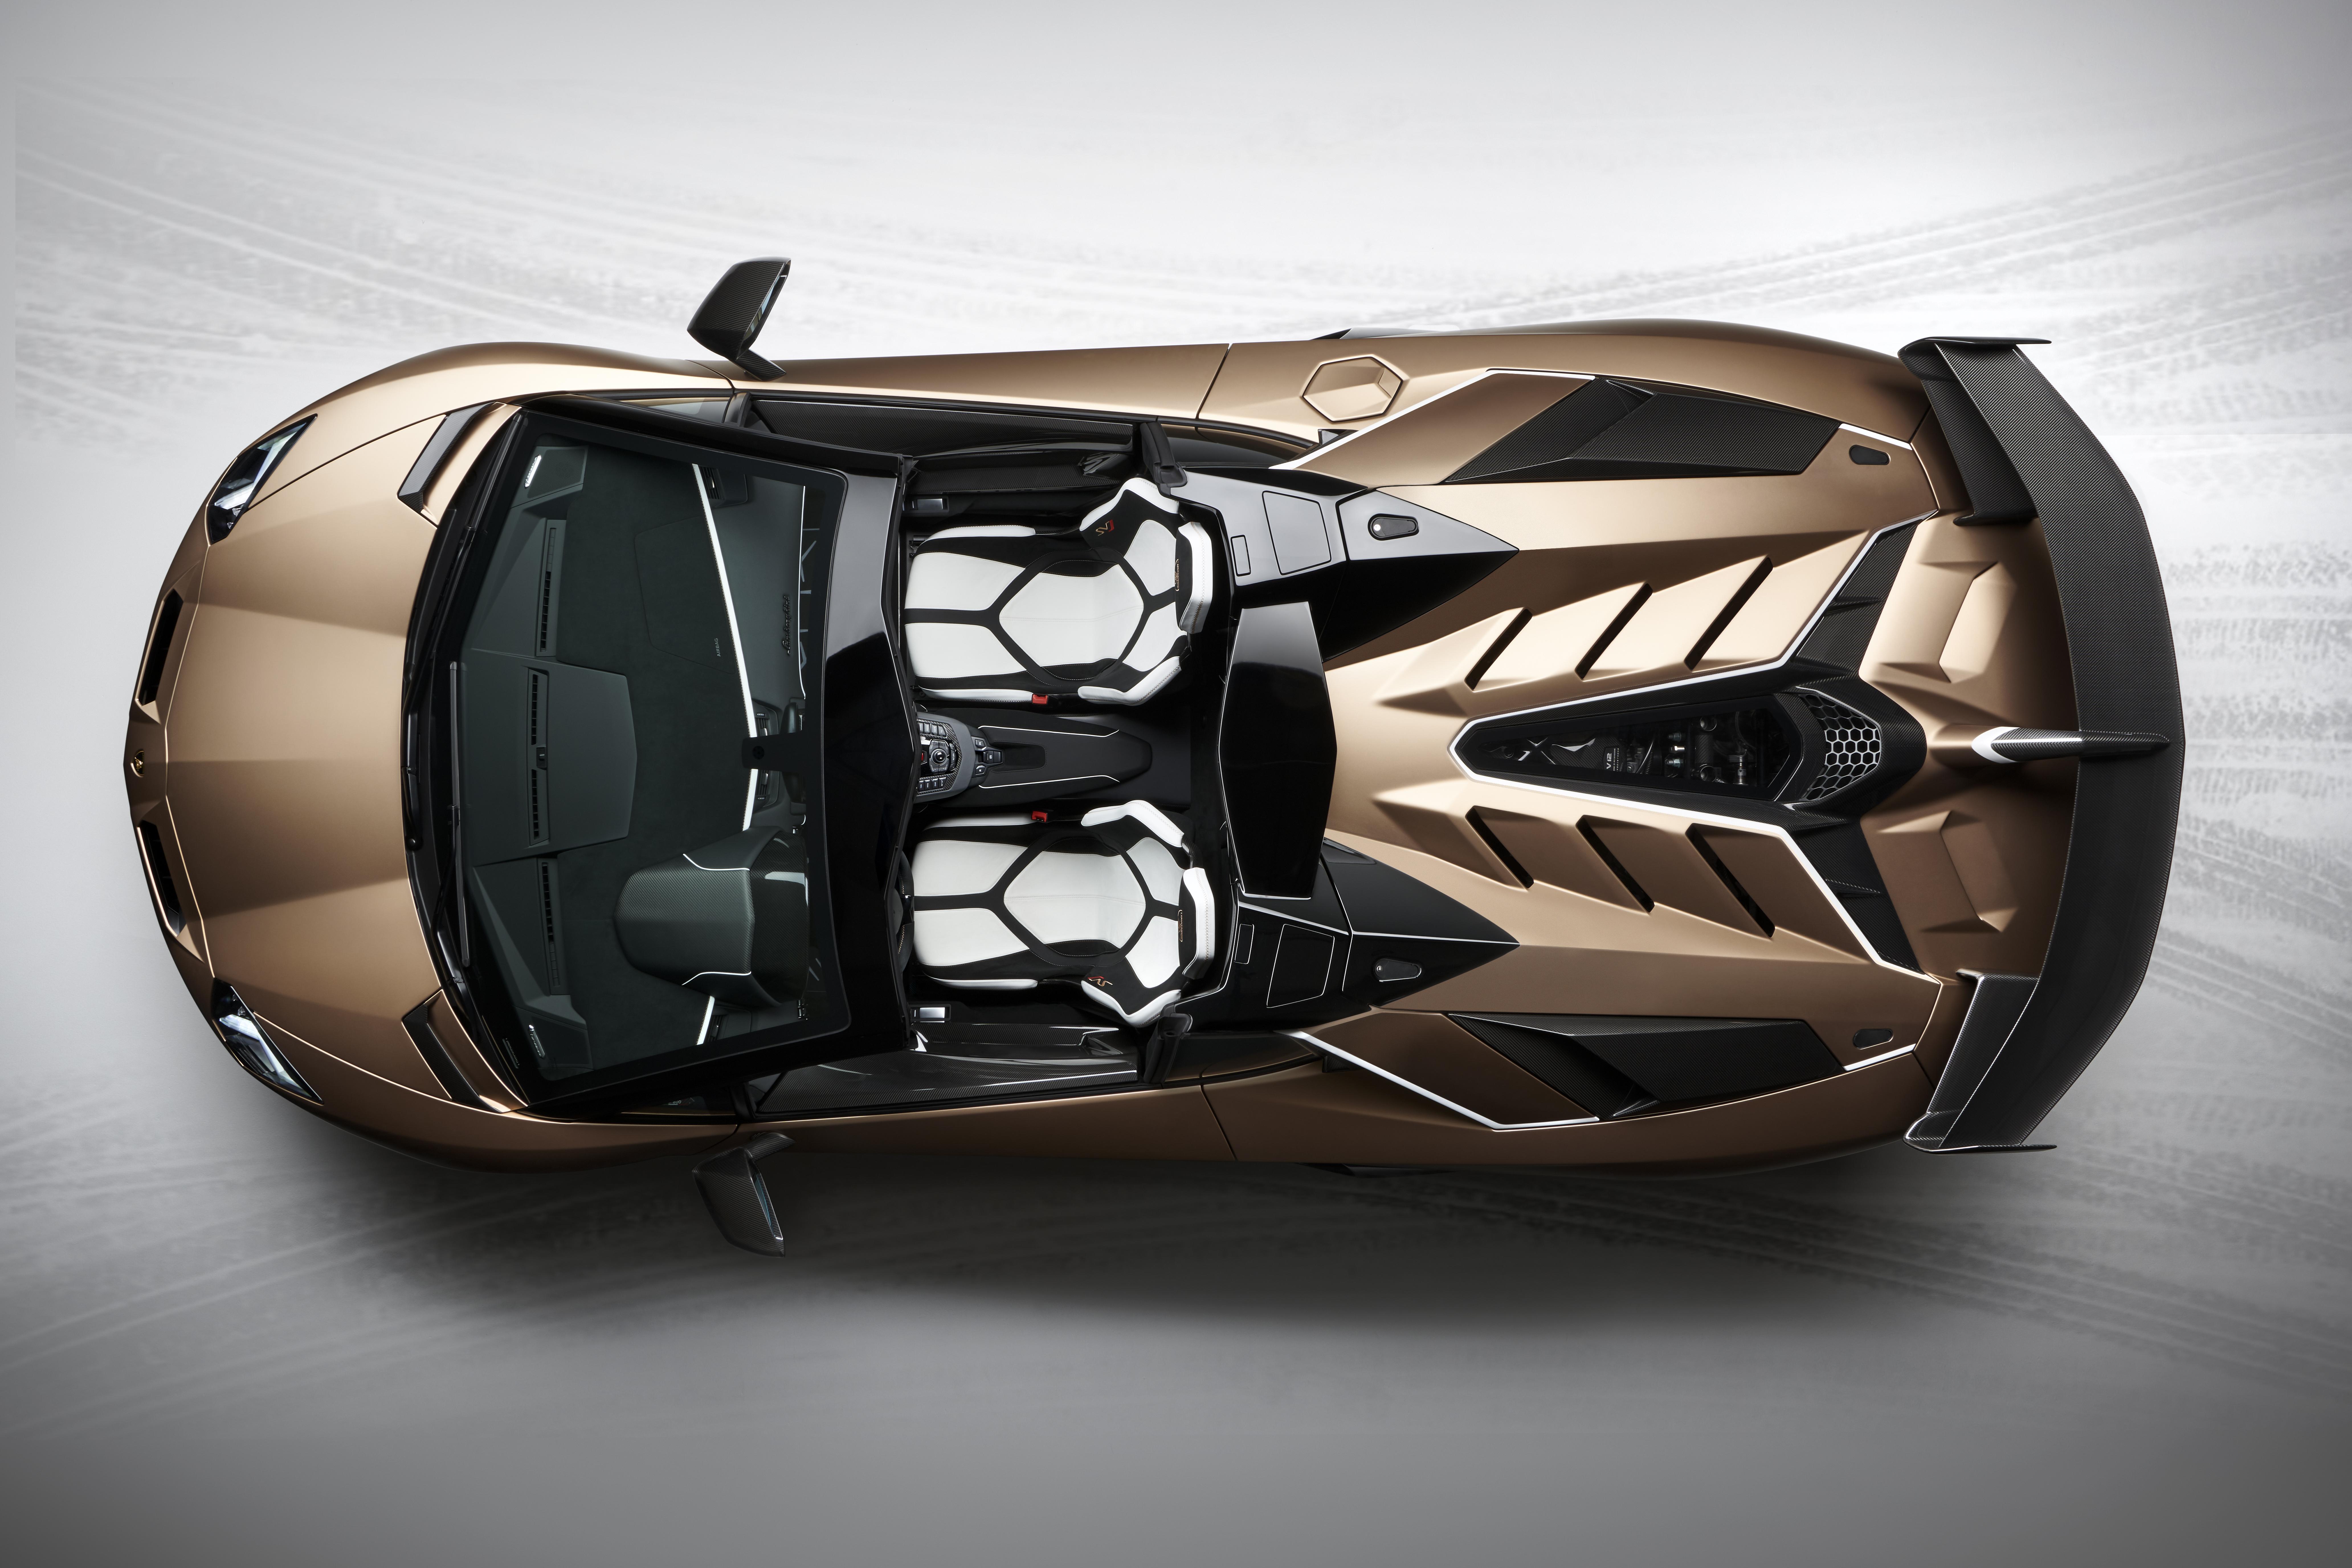 Lamborghini Aventador Svj Roadster Revealed Scuderia Car